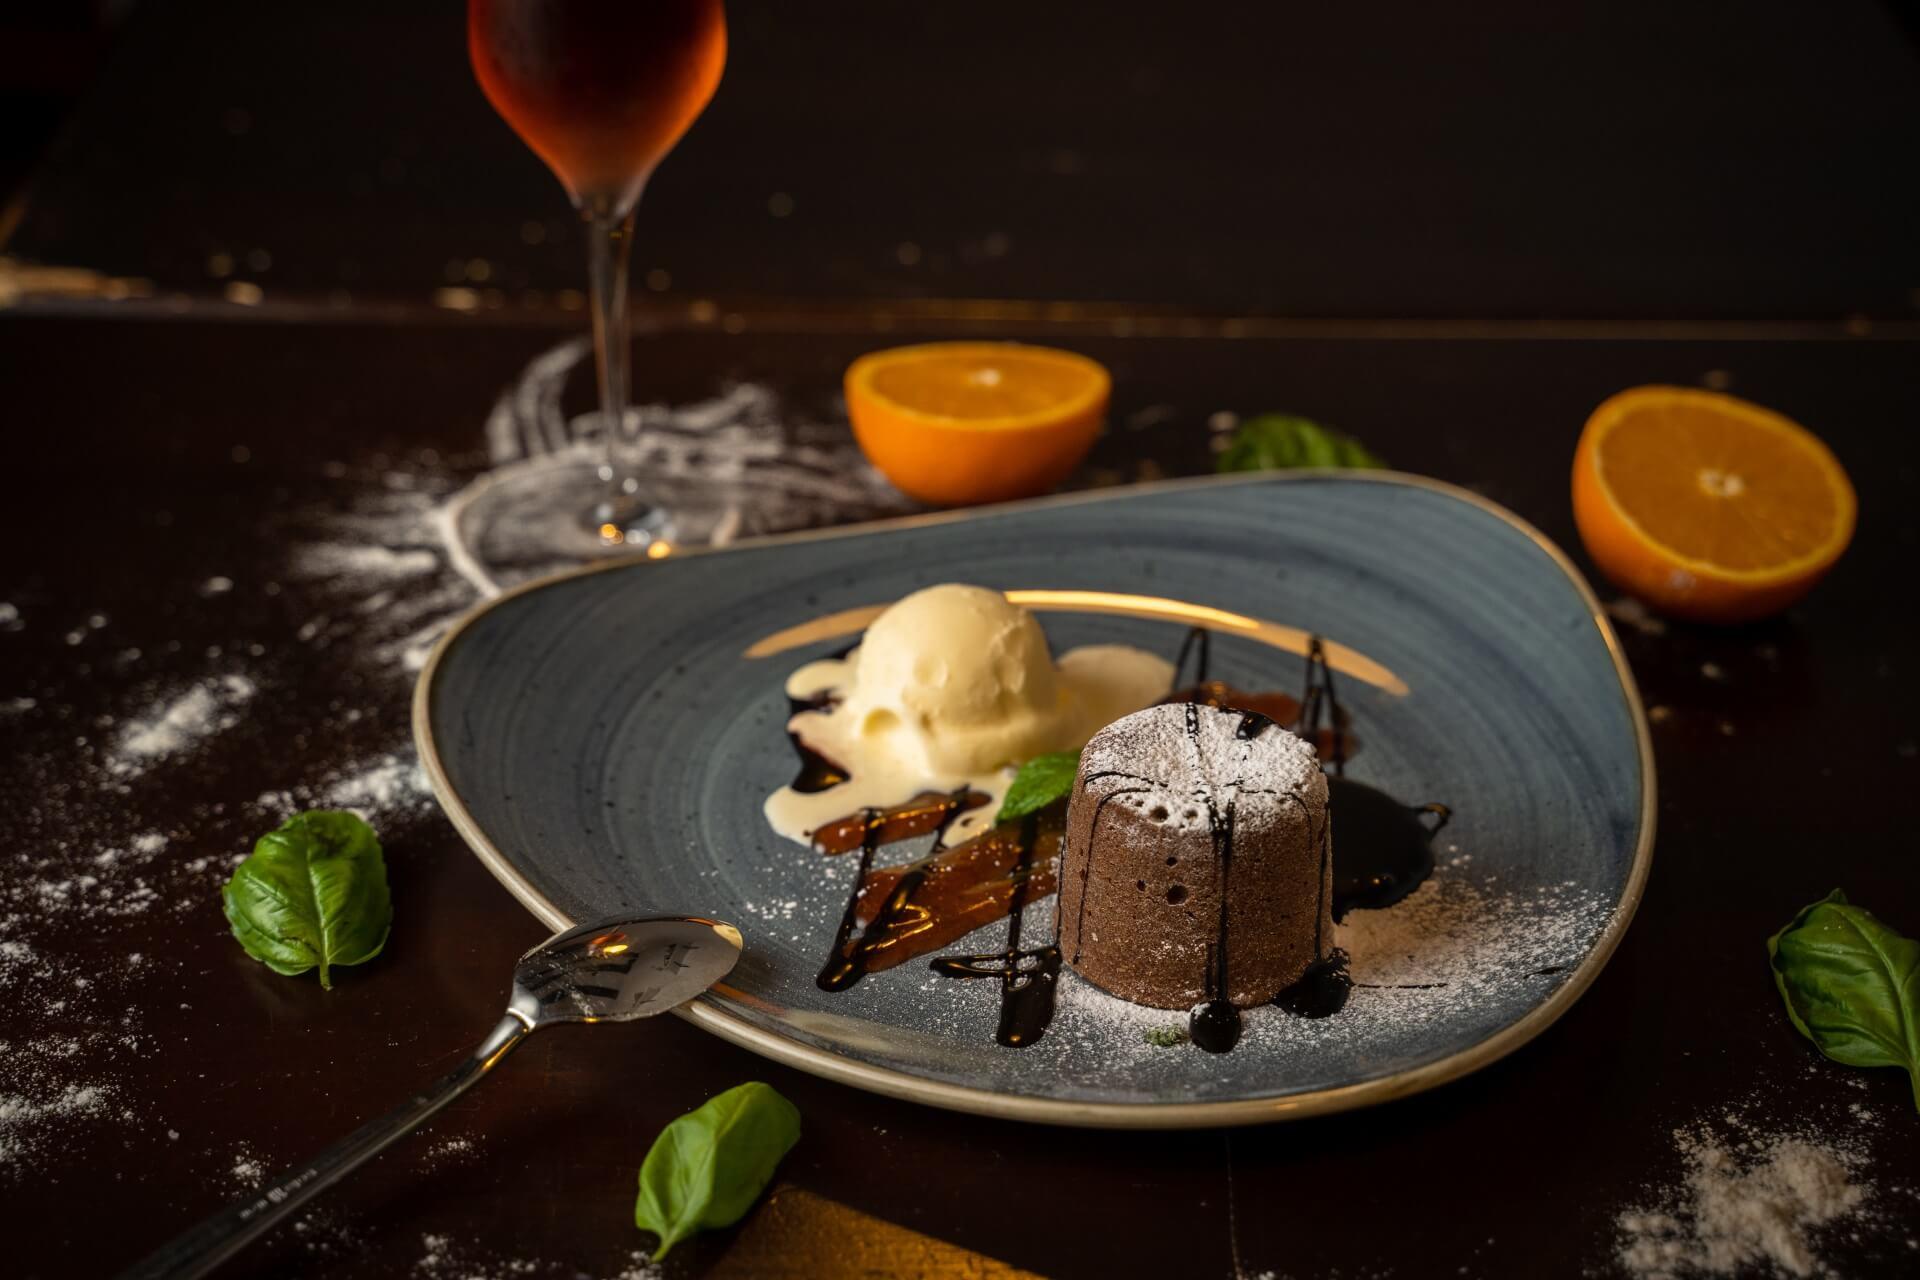 portun dubrovnik dessert